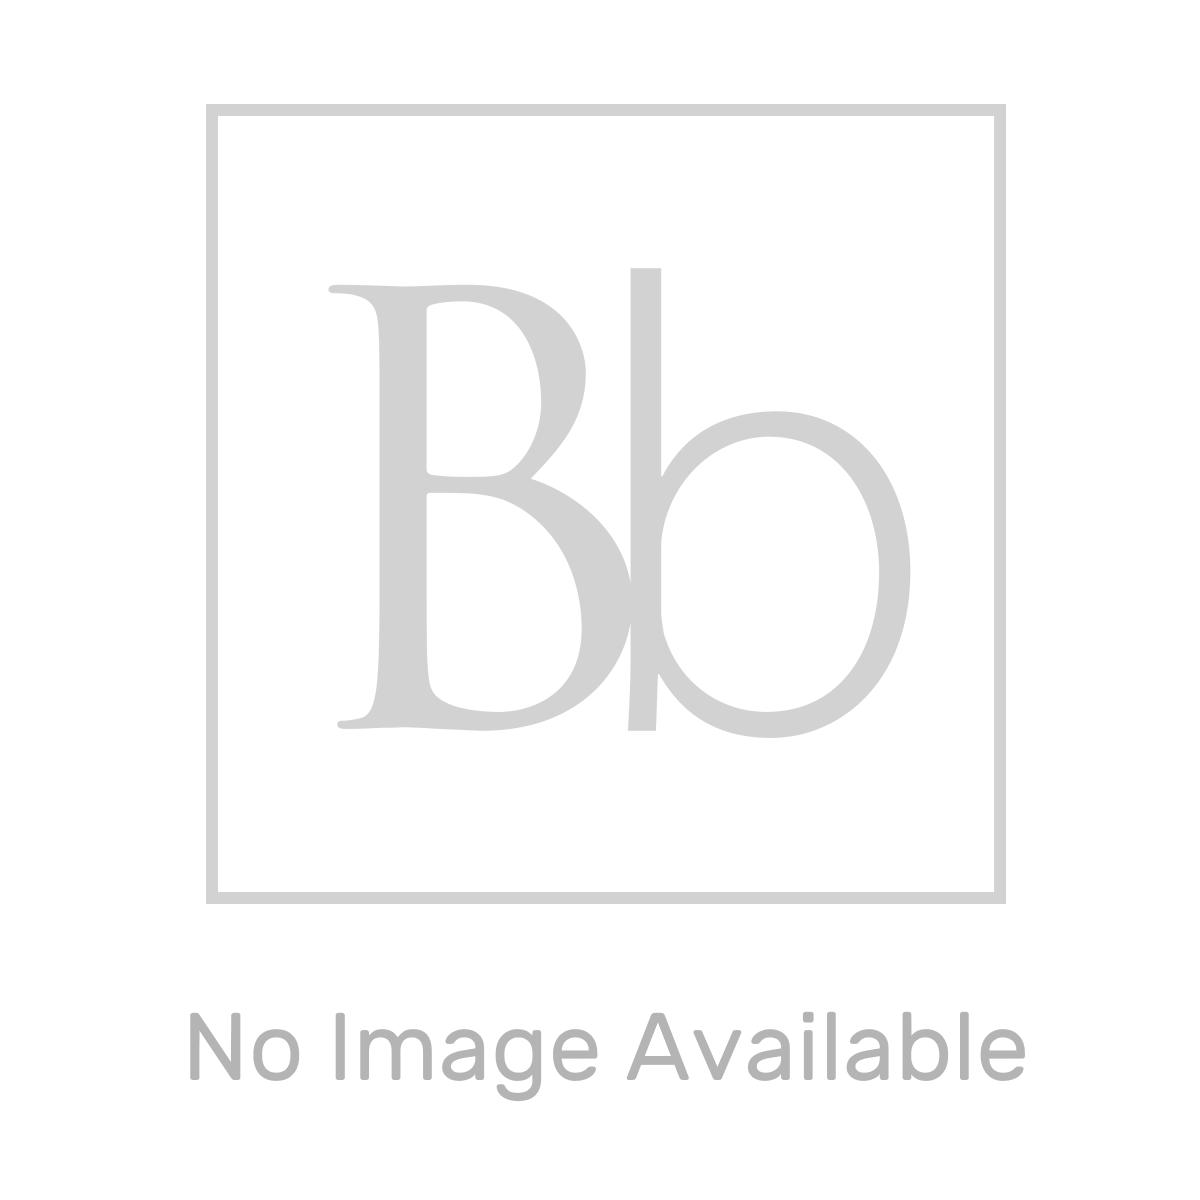 Aquadart Rectangular 1100 x 900 Shower Tray Line Drawing